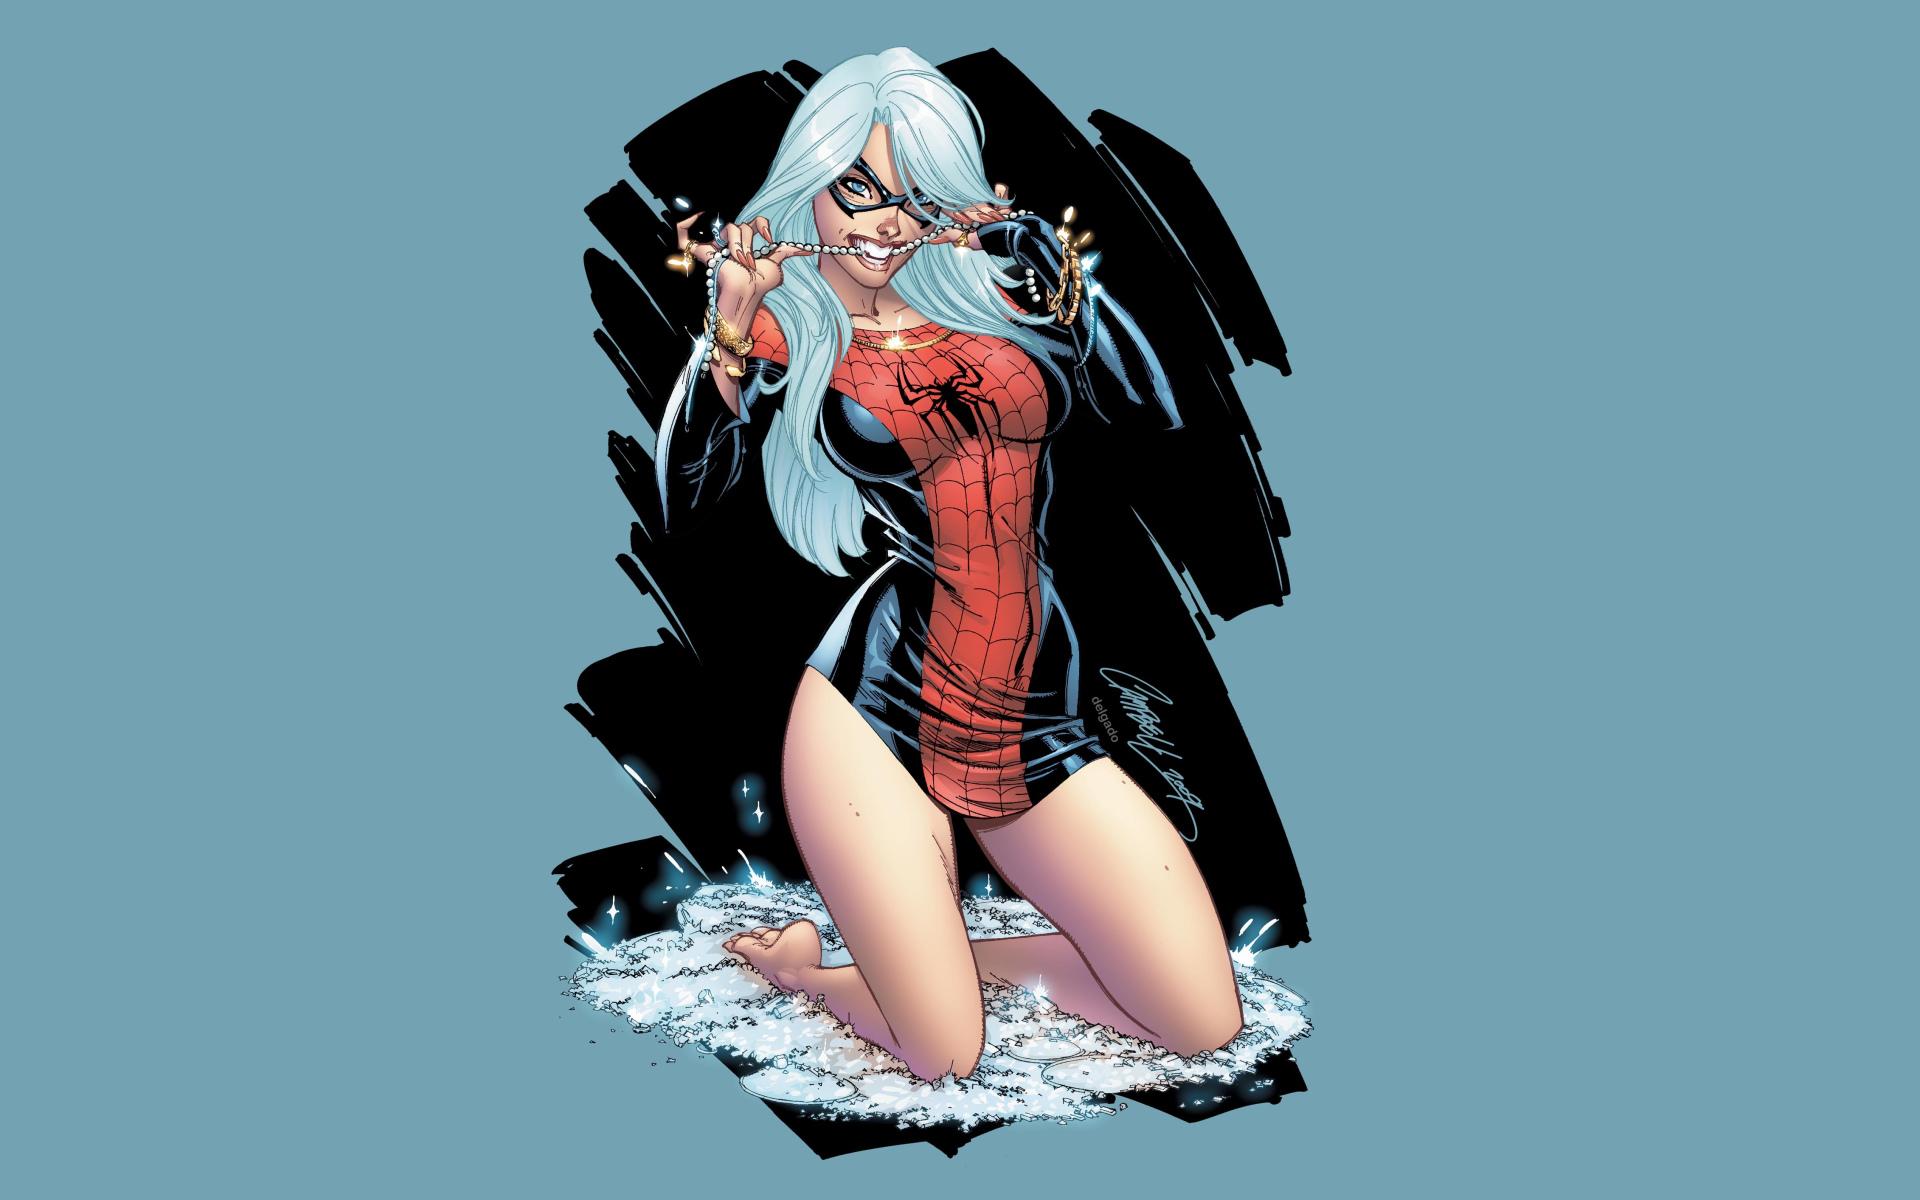 Hd Superhero Wallpapers For Pc Fondos De Pantalla De Spiderman Wallpapers